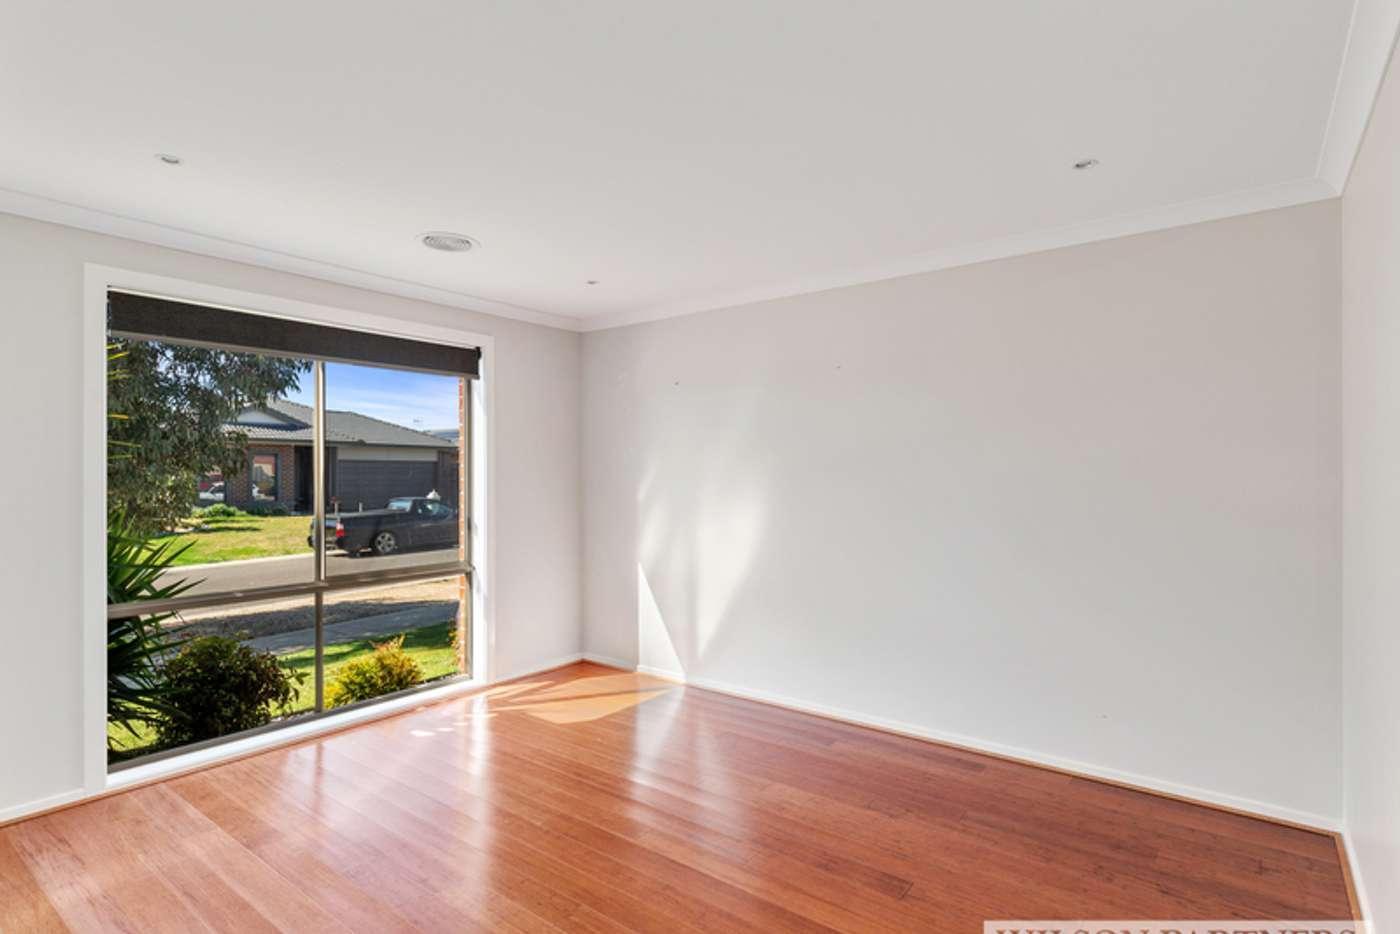 Sixth view of Homely house listing, 4 Casuarina Street, Kilmore VIC 3764